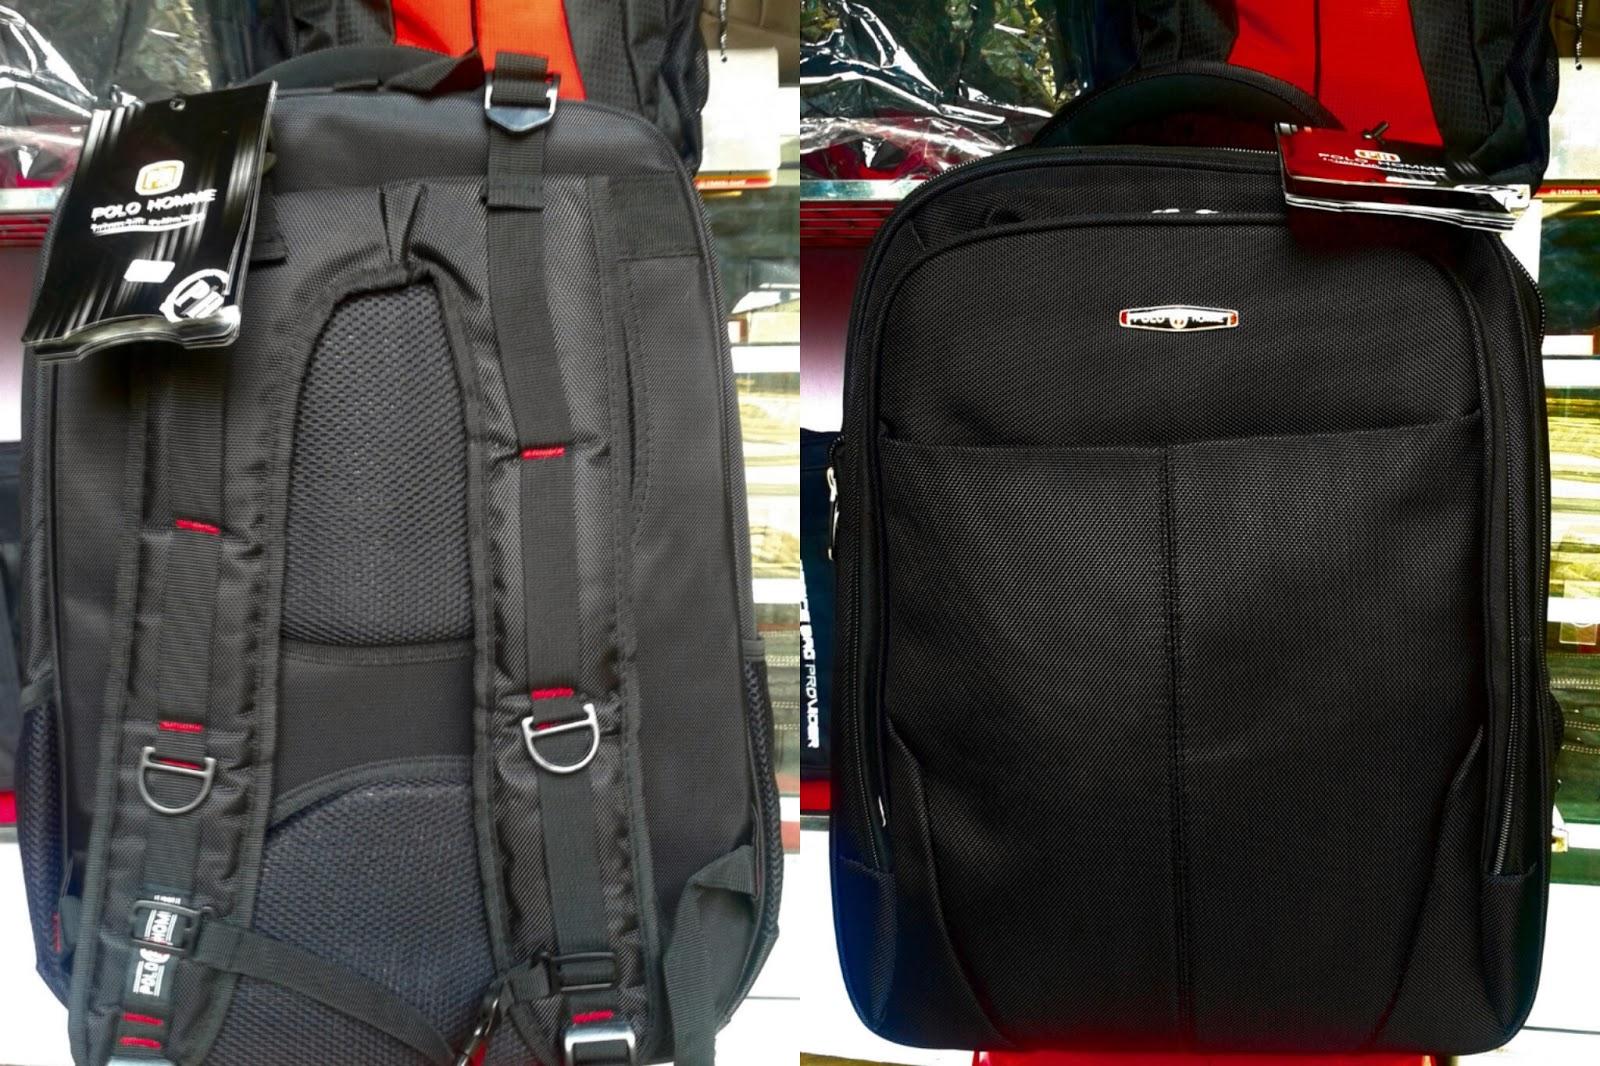 jual tas ransel laptop polo murah grosir tas travel bag anak